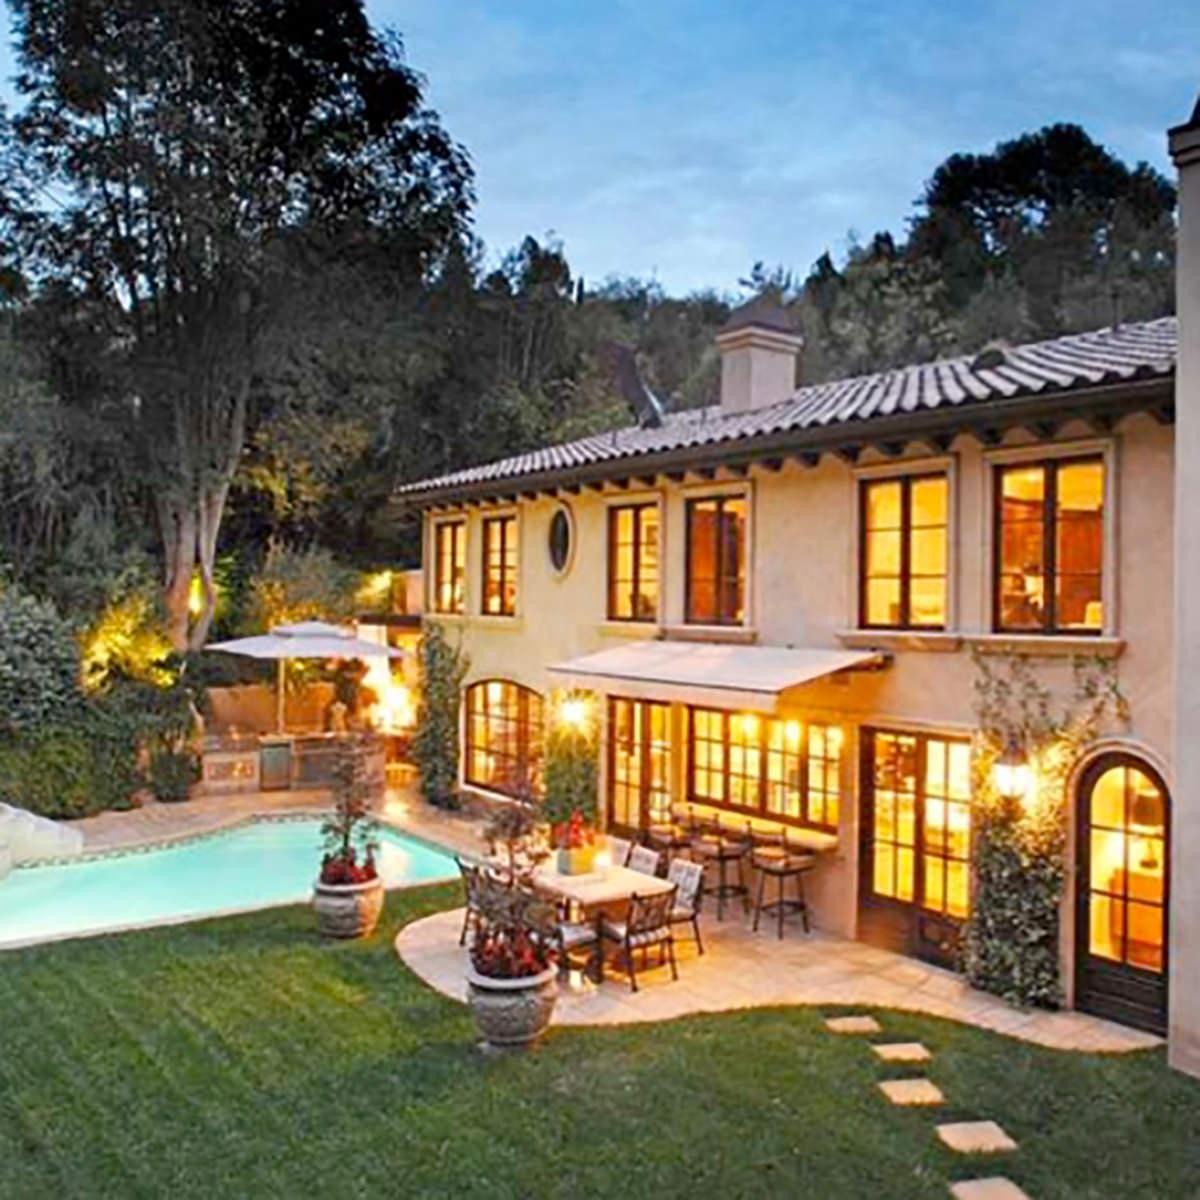 beverly-hills-california-remodel-backyard-interior-design-montgomery-home-2.jpg